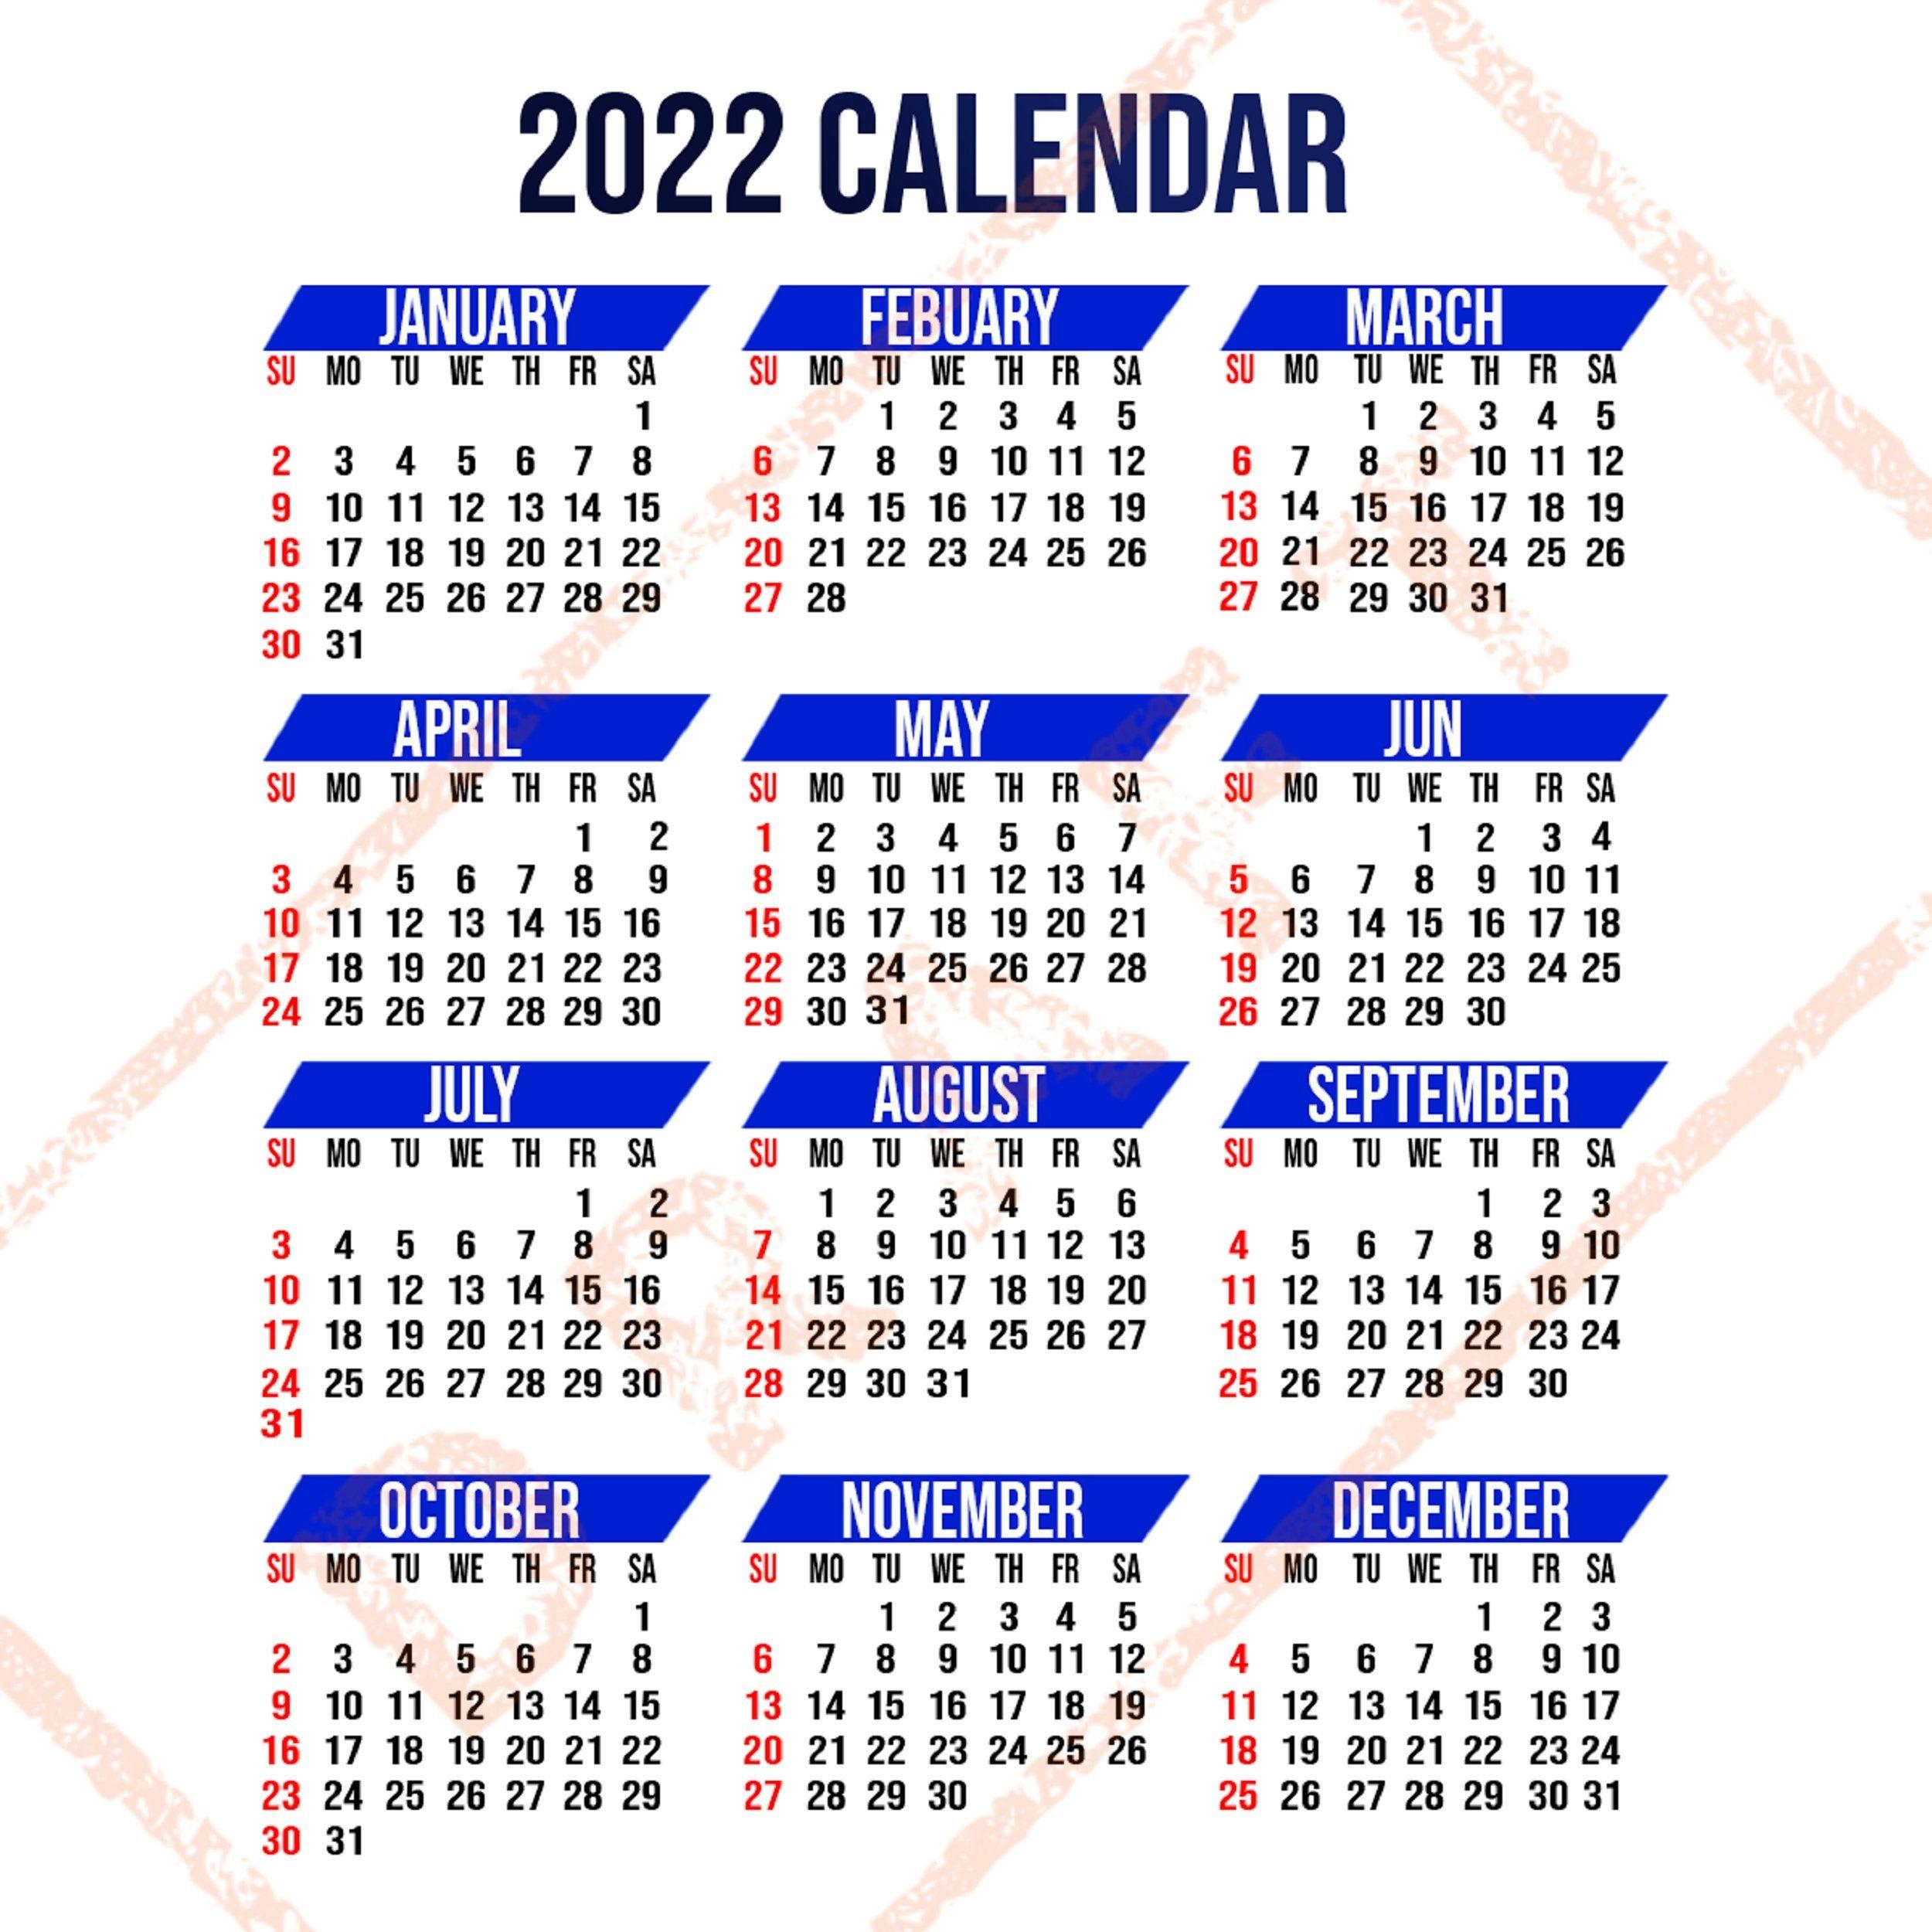 2022 Calendar Printable Yearly Calendar 12-Months Calendar